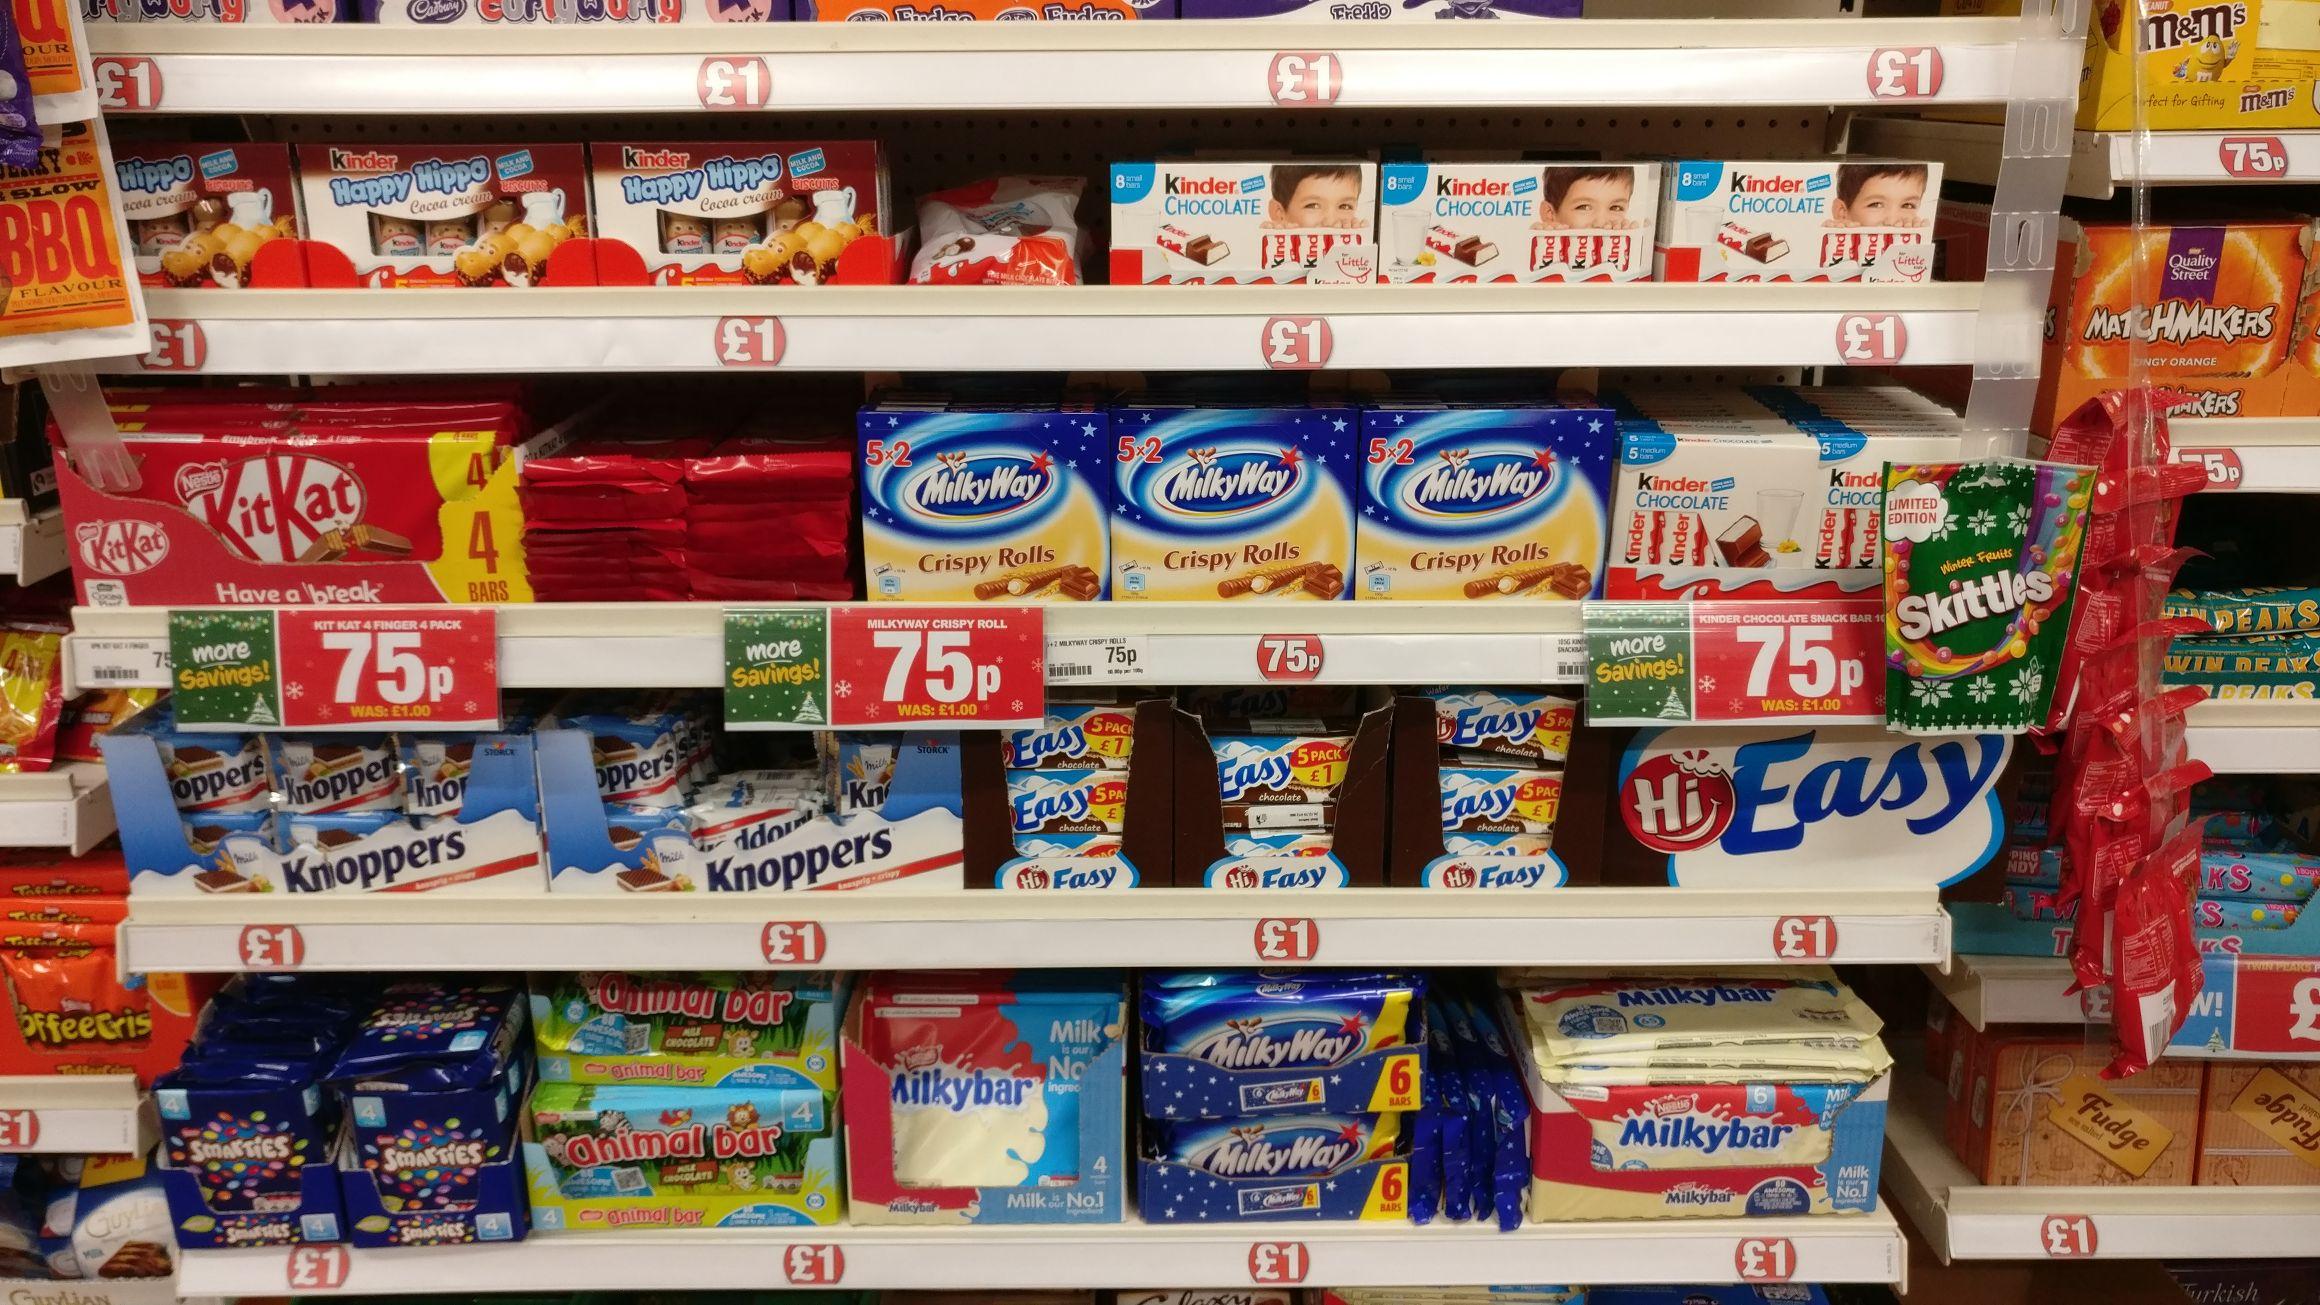 4x 4 finger Kit Kats 75p, 5x 2 crispy rolls 75p & 5 medium Kinder chocolate bars 75p - Poundland (Instore)